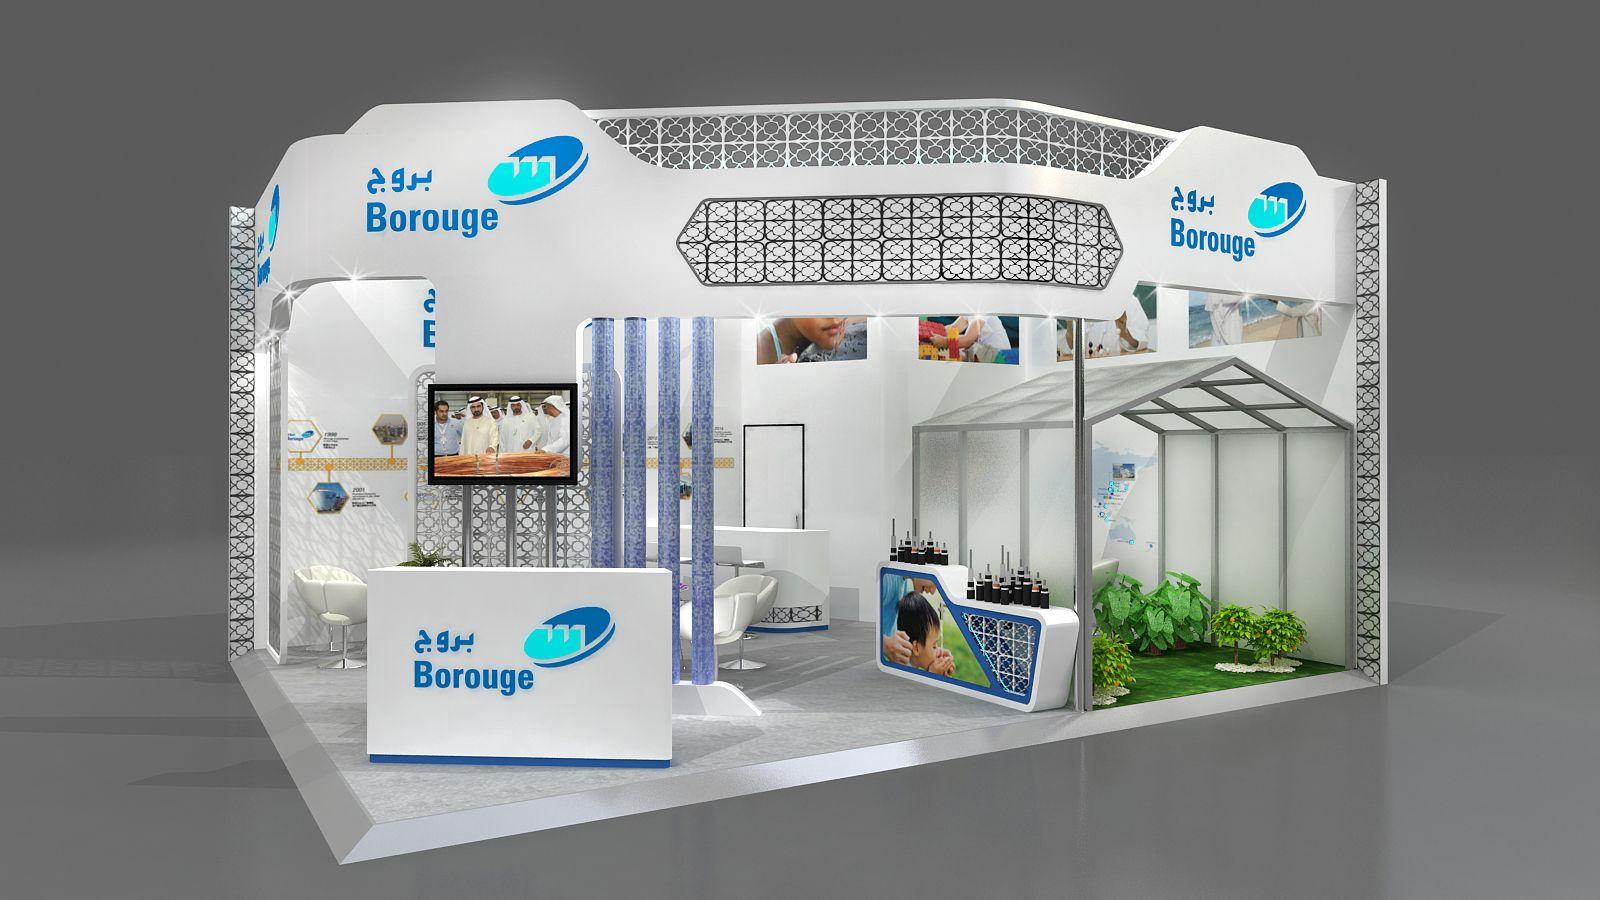 School Exhibition Stall Design : Borouge exhibition stands pinterest exhibit design